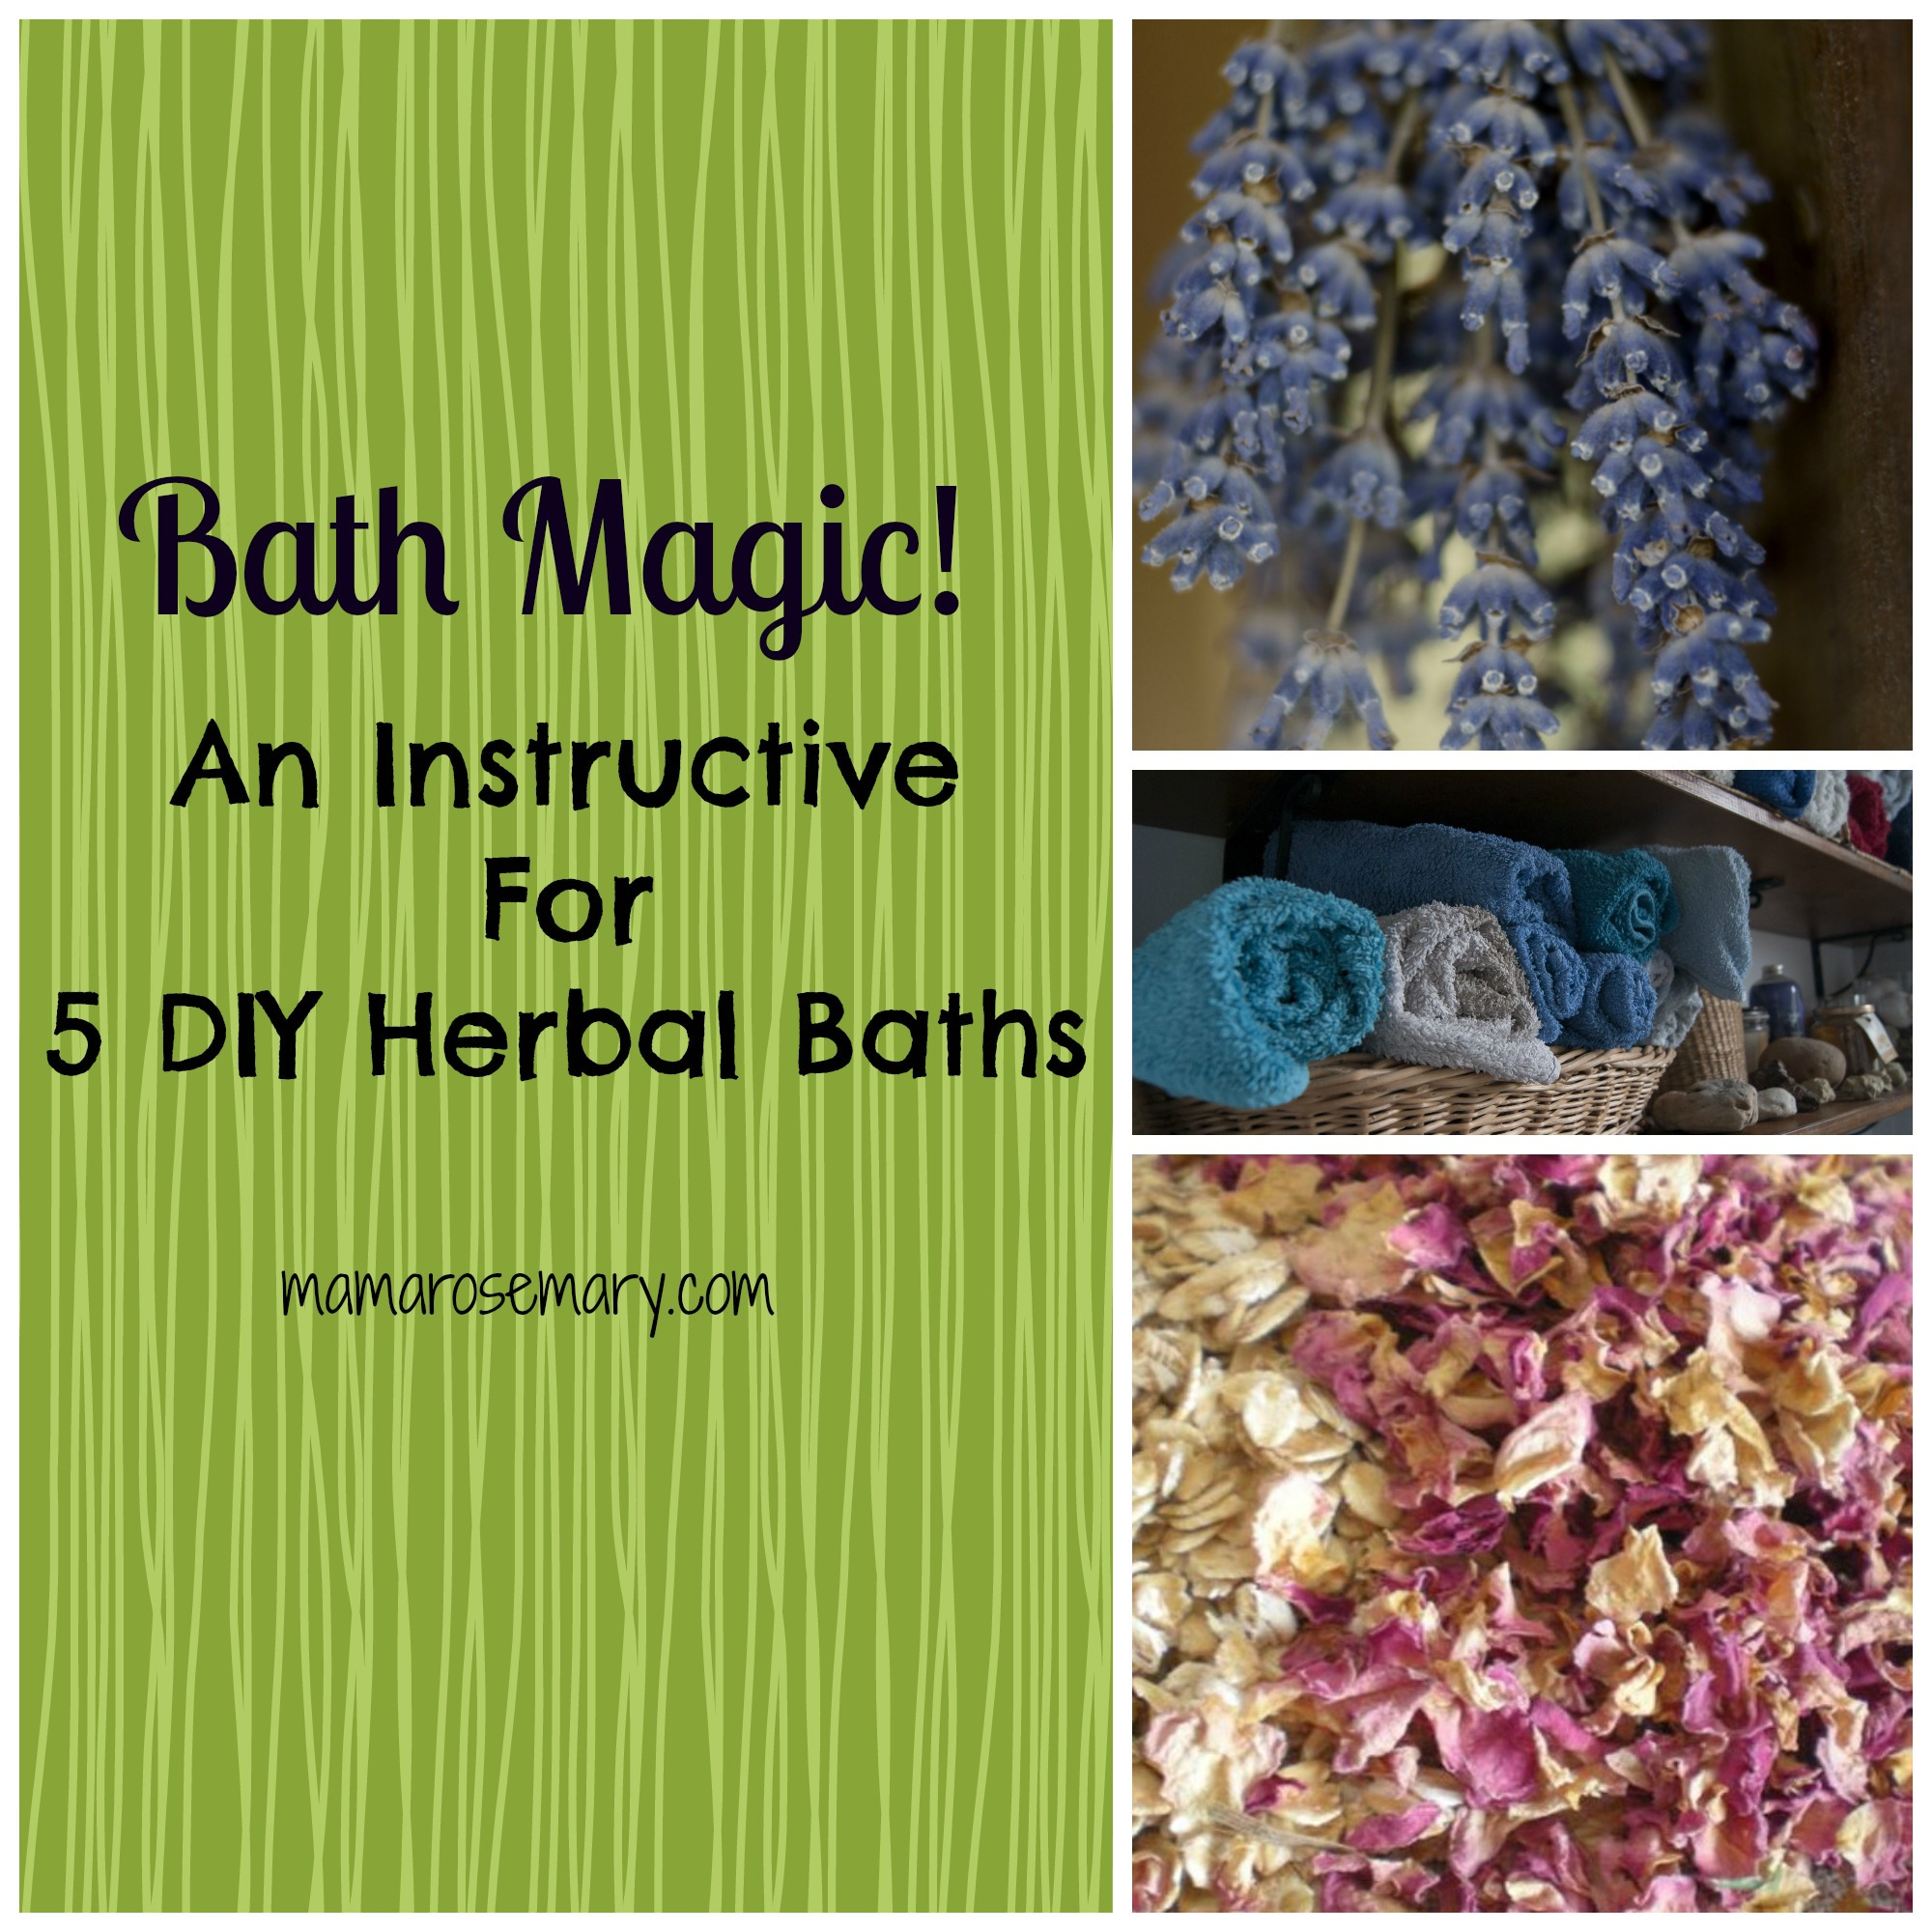 Bath Magic! An Instructive For 5 DIY Herbal Baths — Mama Rosemary